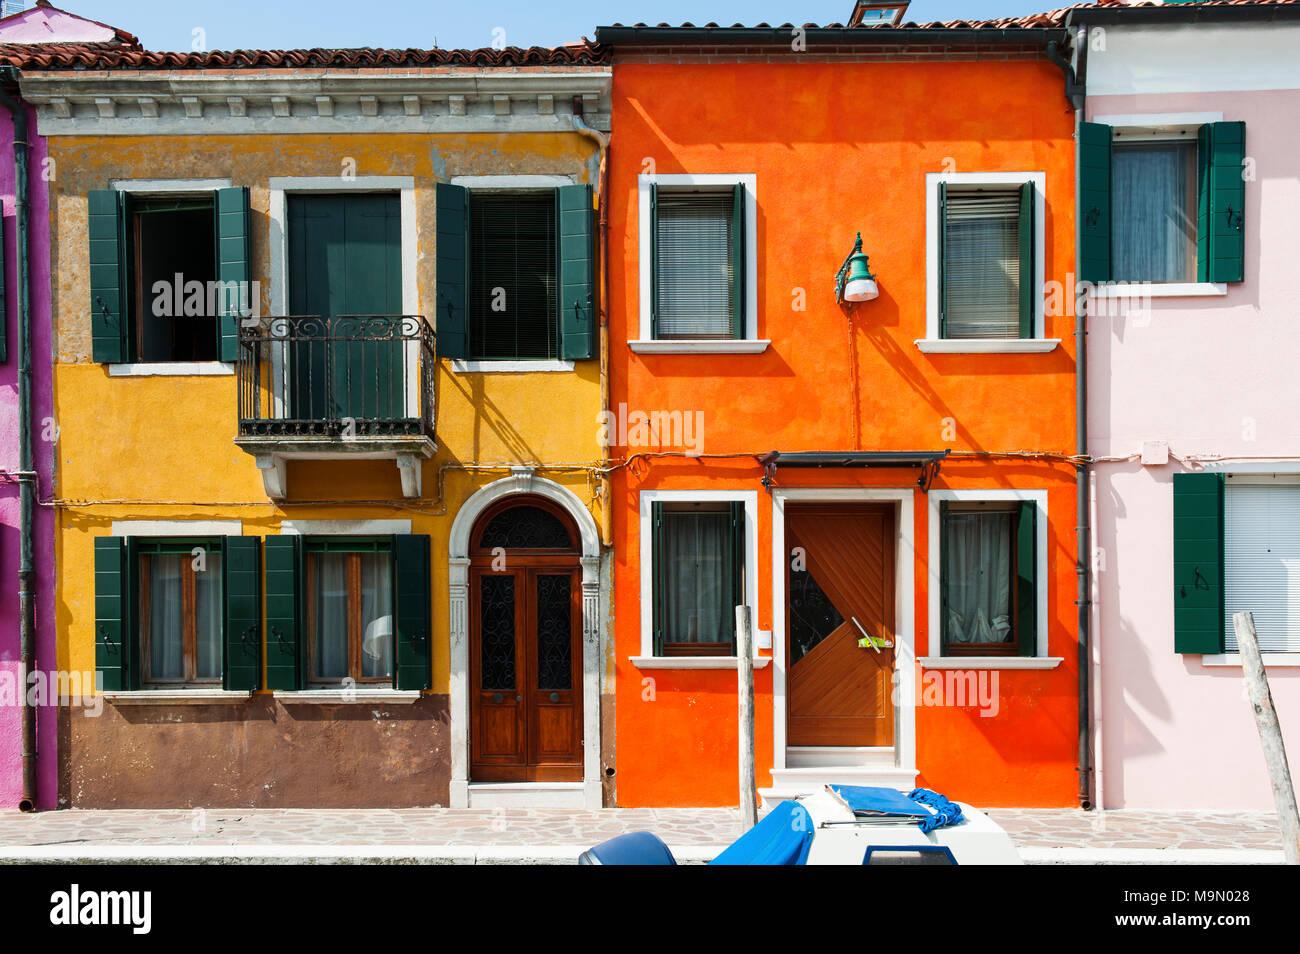 Orange and yellow house in Burano, a little island in Venetian lagoon, Italy, Europe - Stock Image